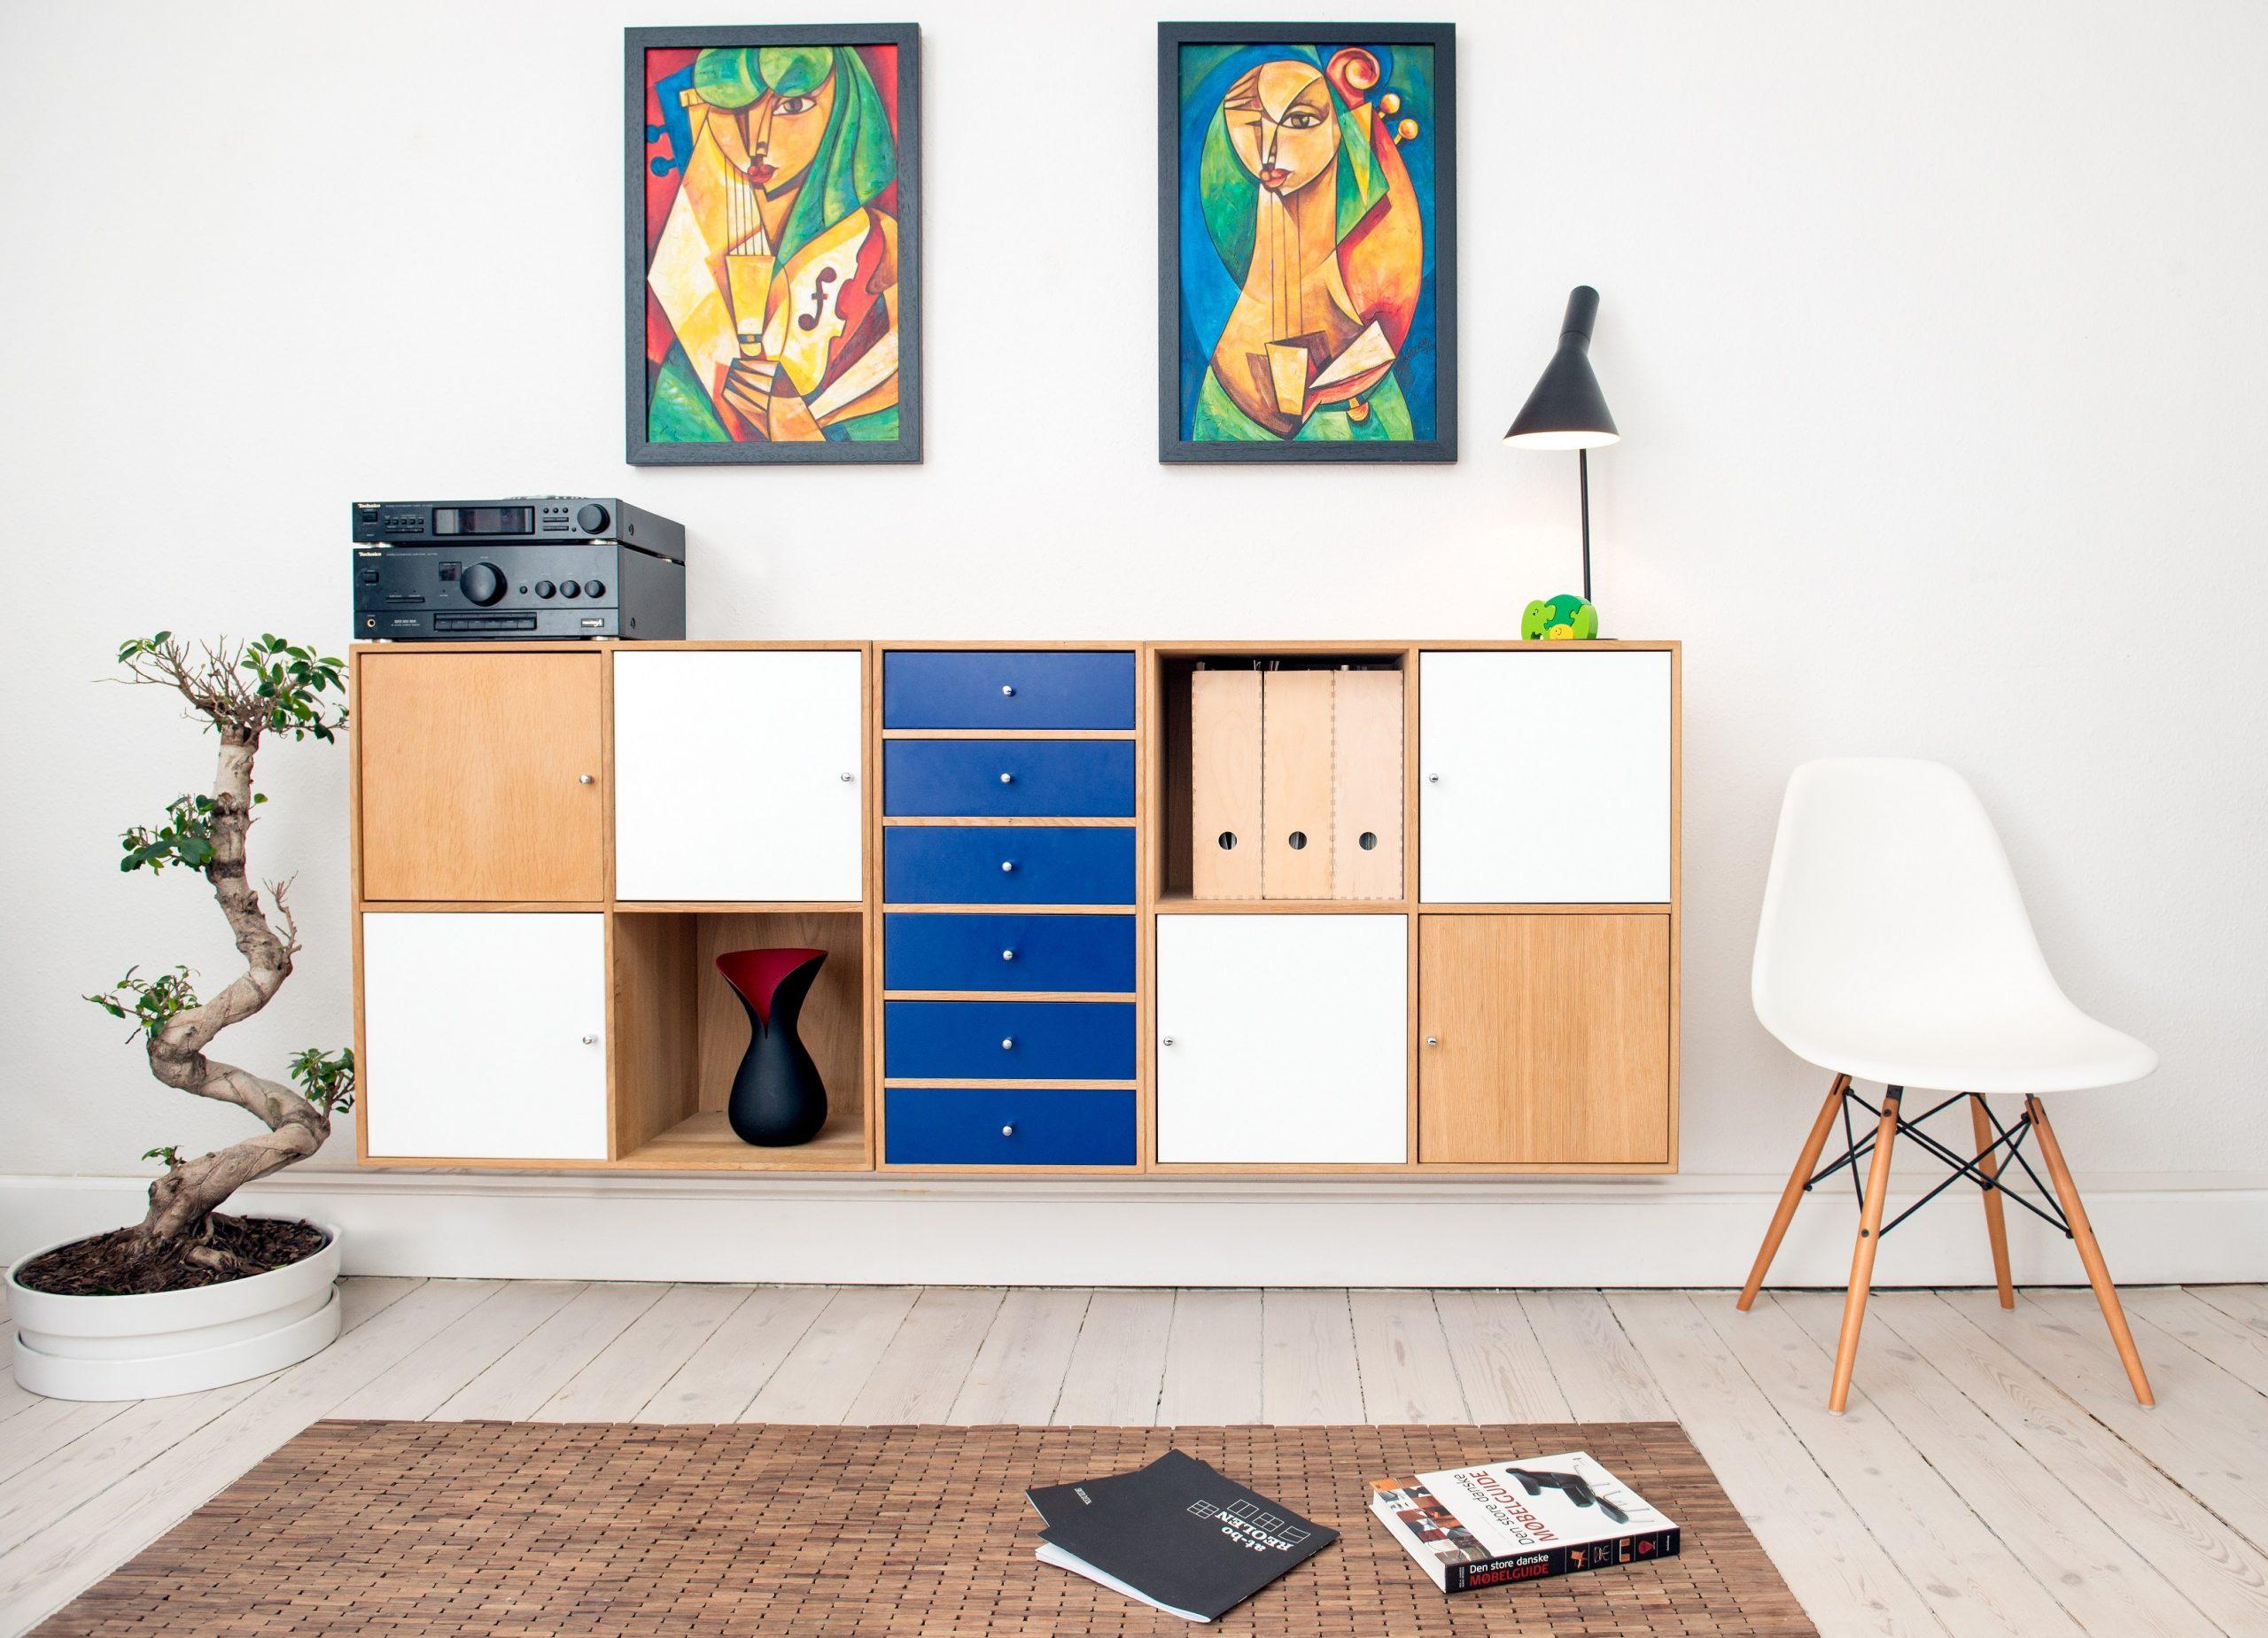 Accesorios para decorar tu hogar al estilo Pinterest